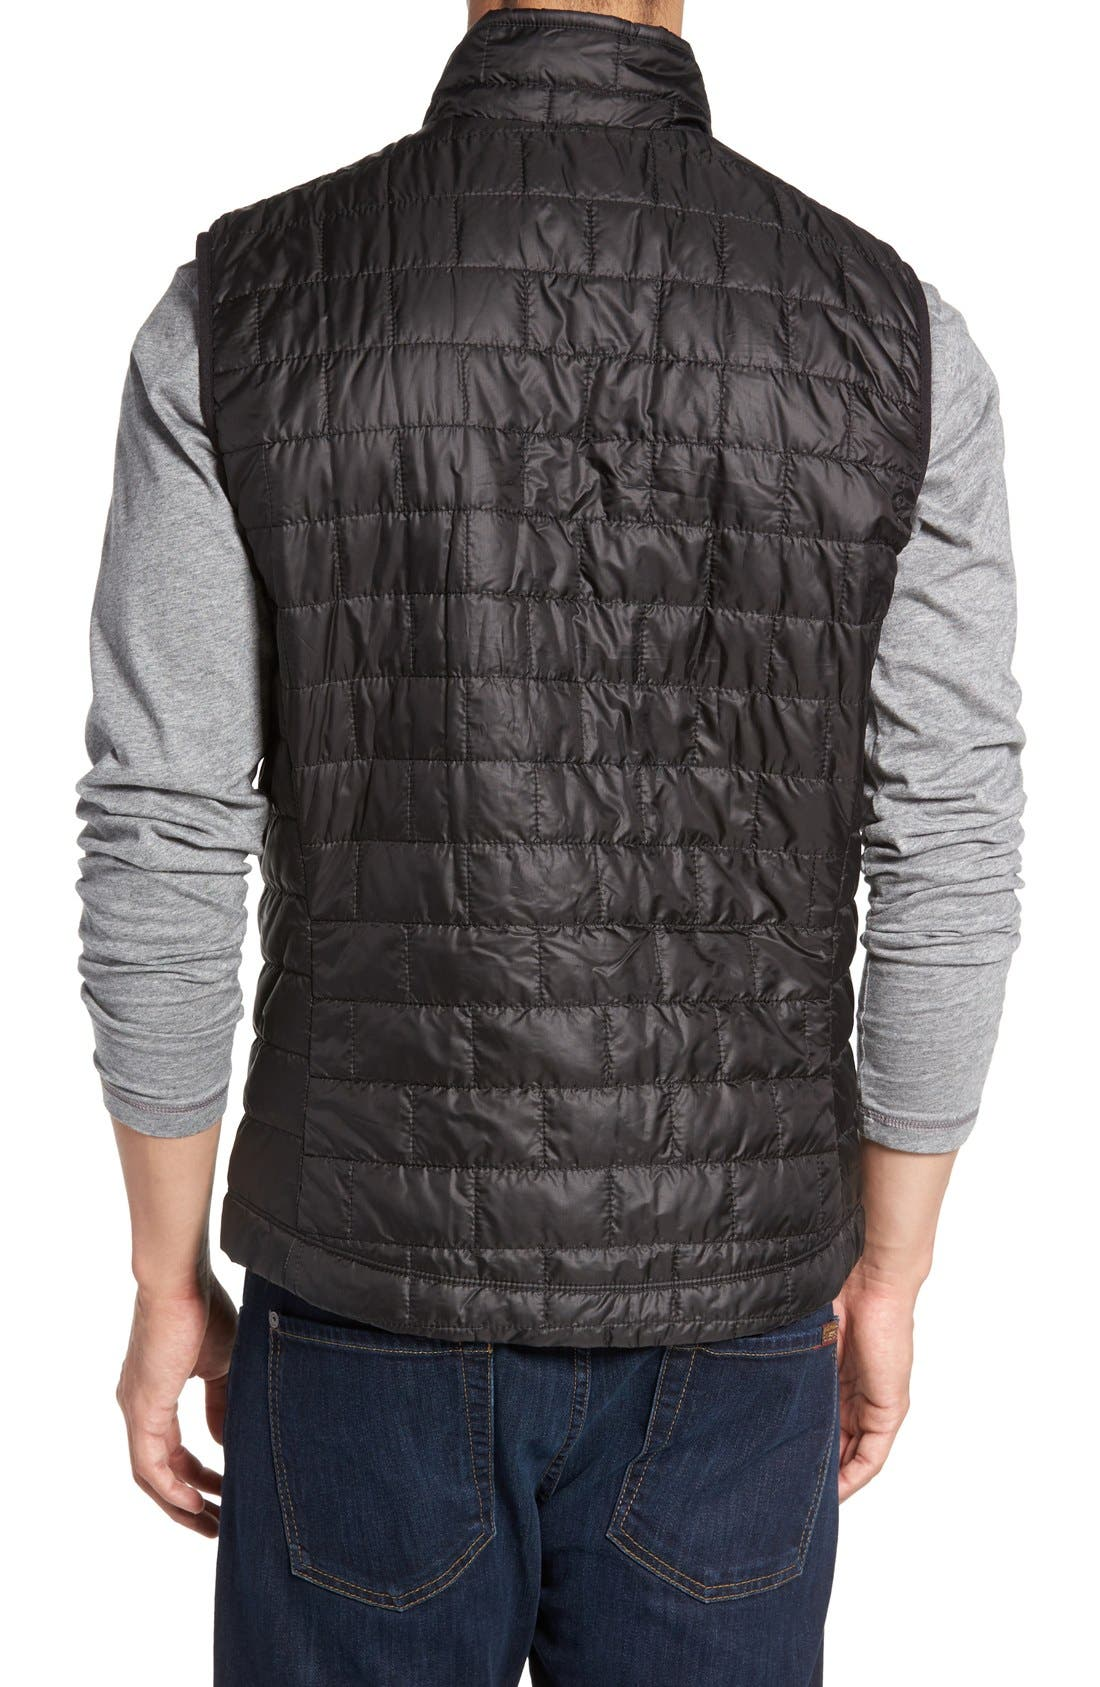 PATAGONIA, Nano Puff<sup>®</sup> Vest, Alternate thumbnail 4, color, BLACK